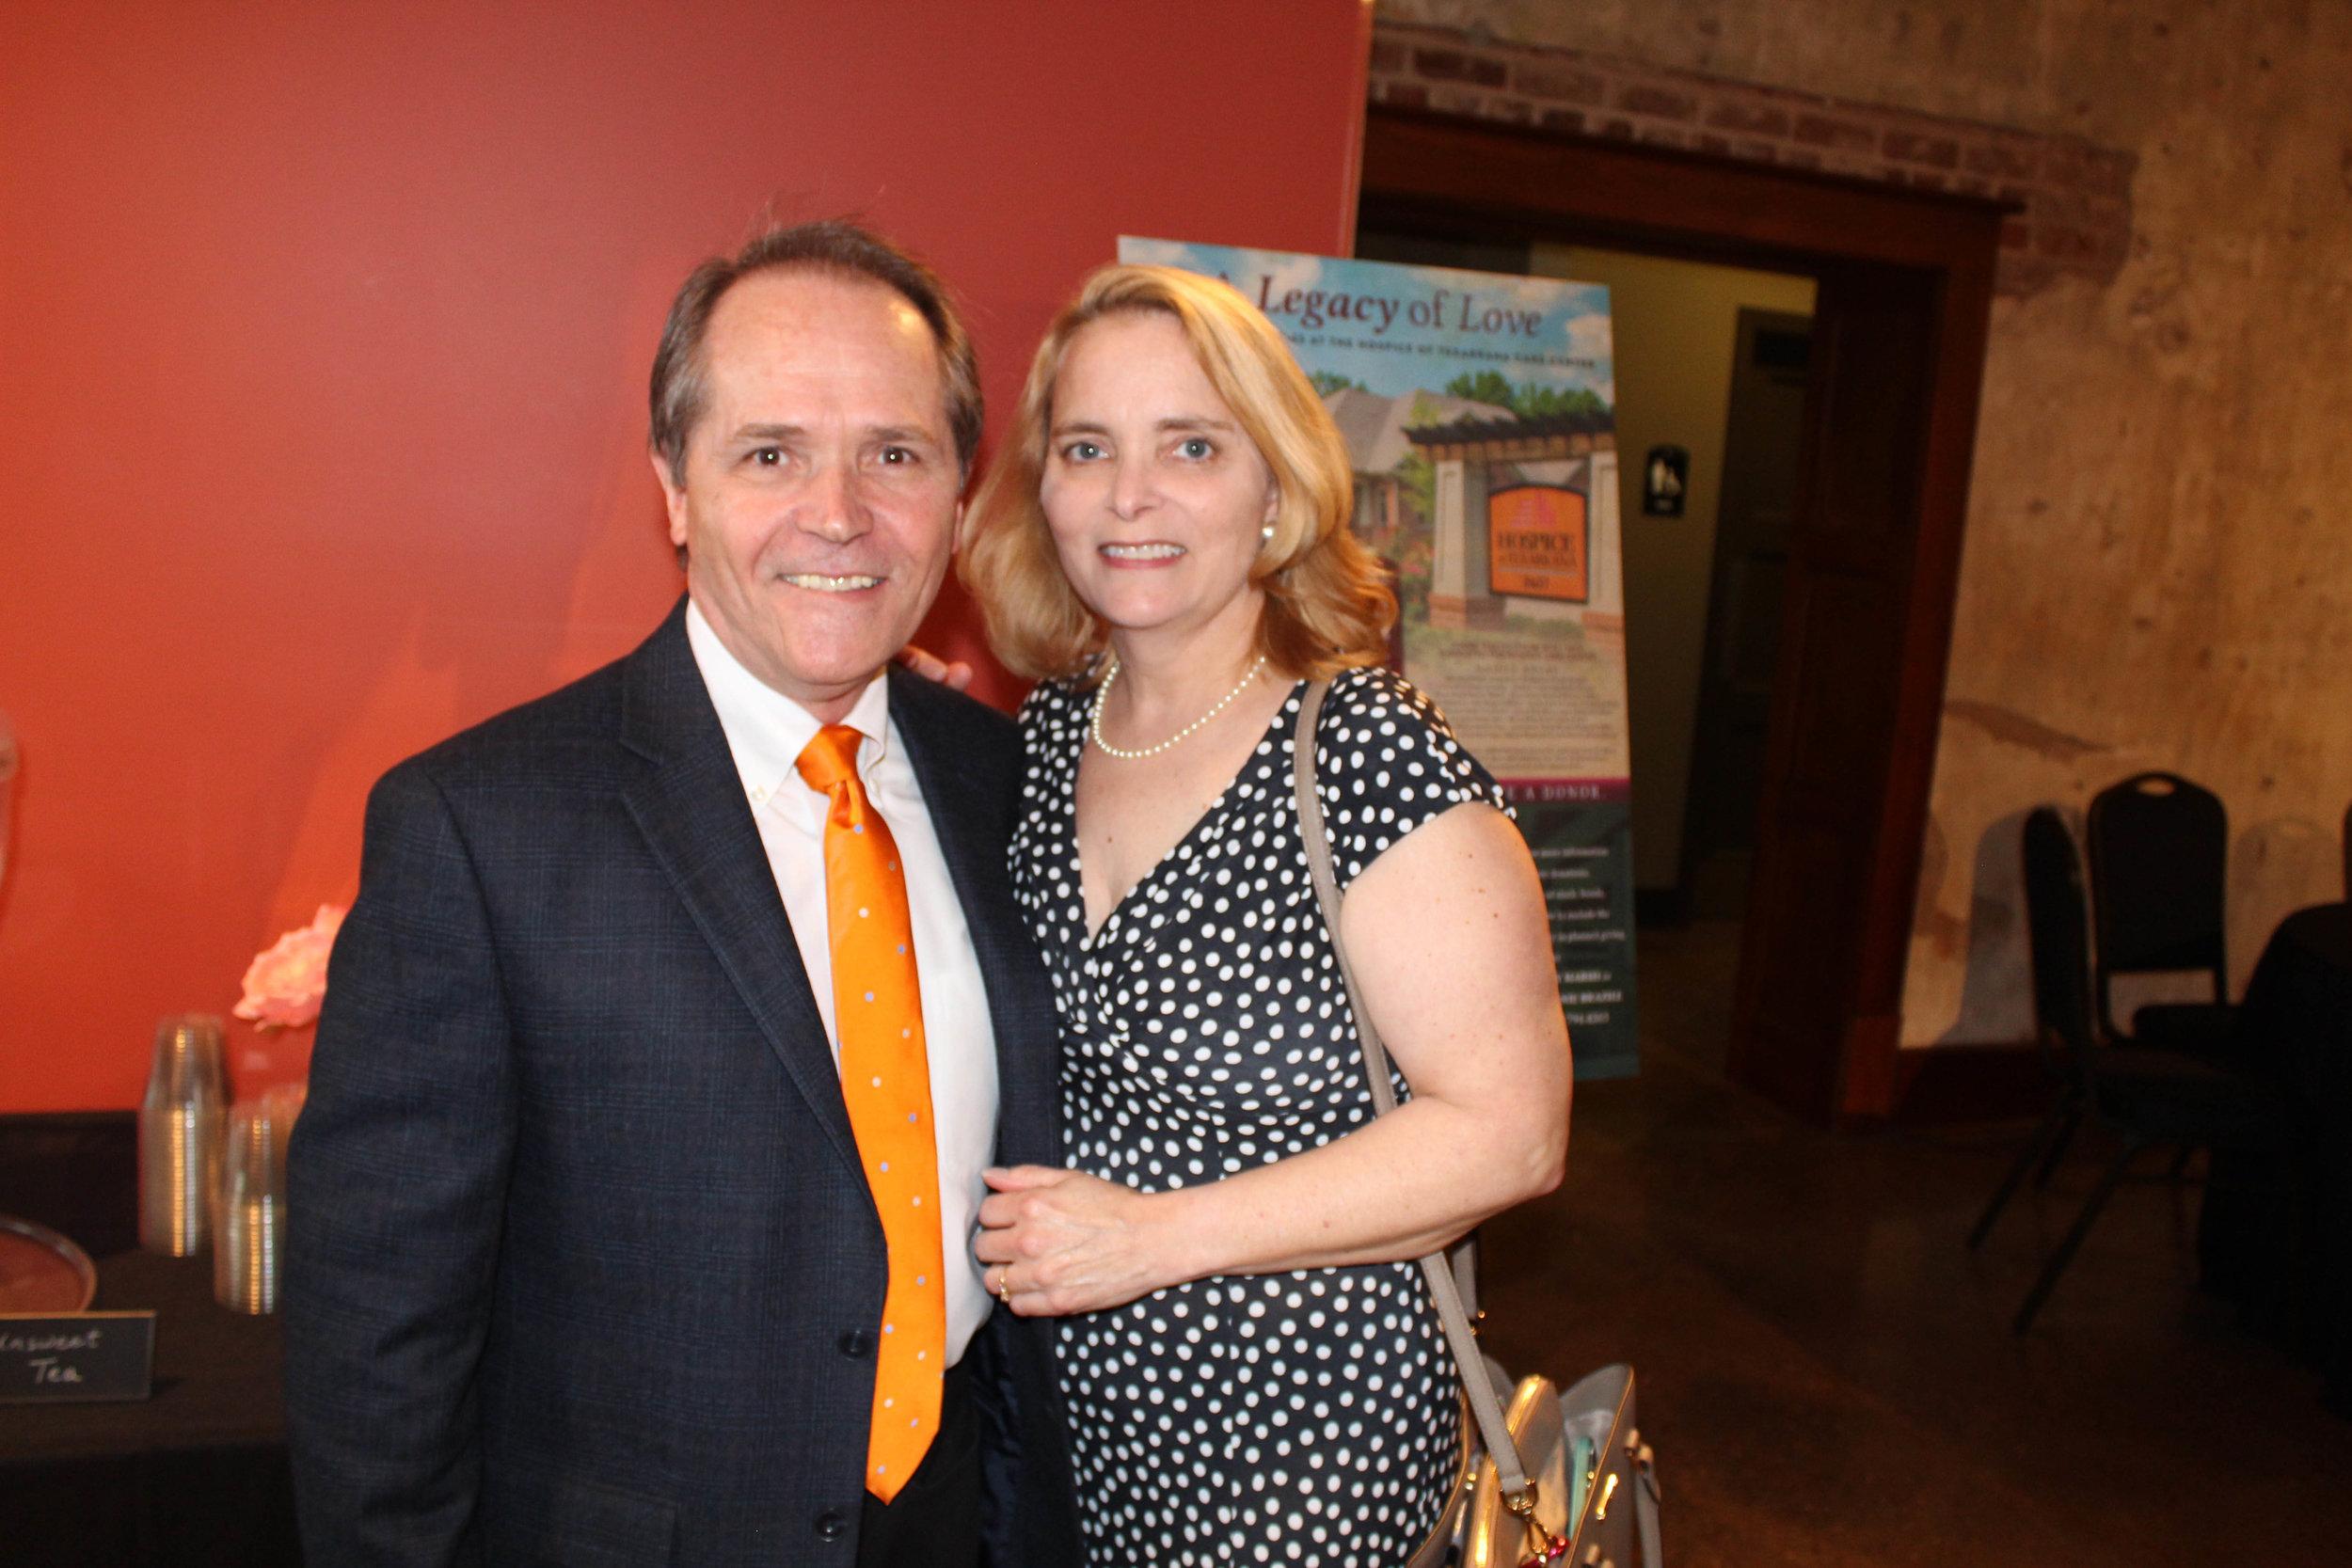 Brian and Patti Goesl